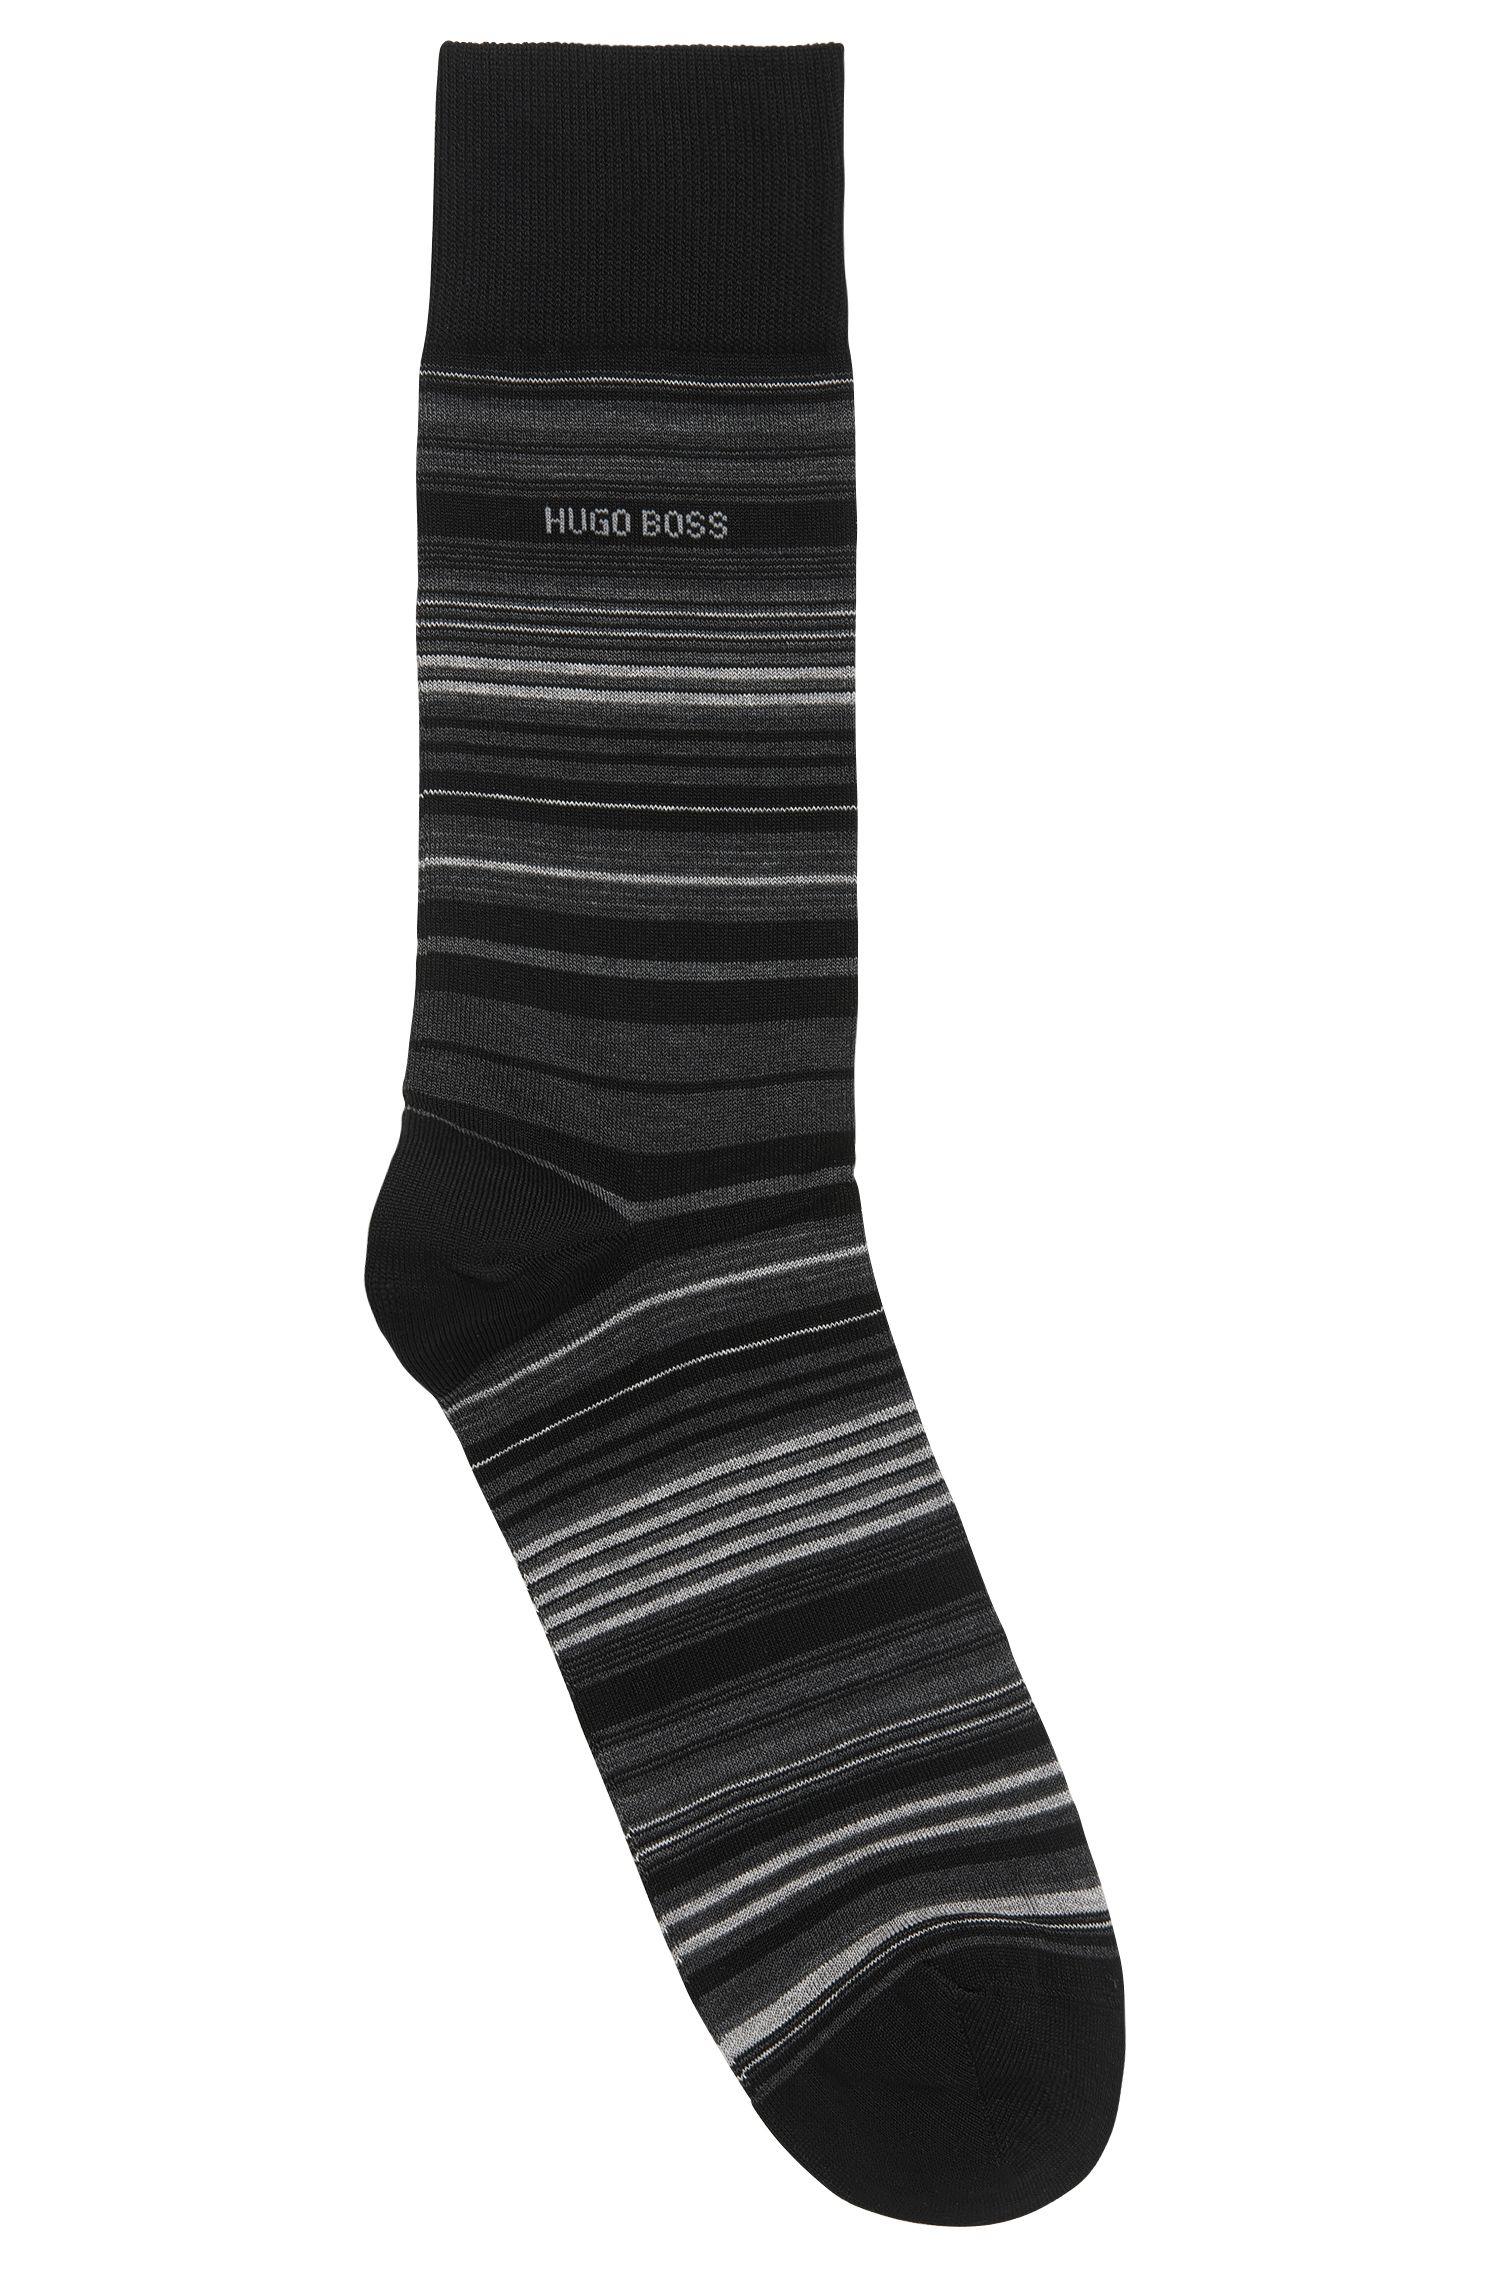 Striped Stretch Cotton Blend Socks | RS Multistripe US MC, Black